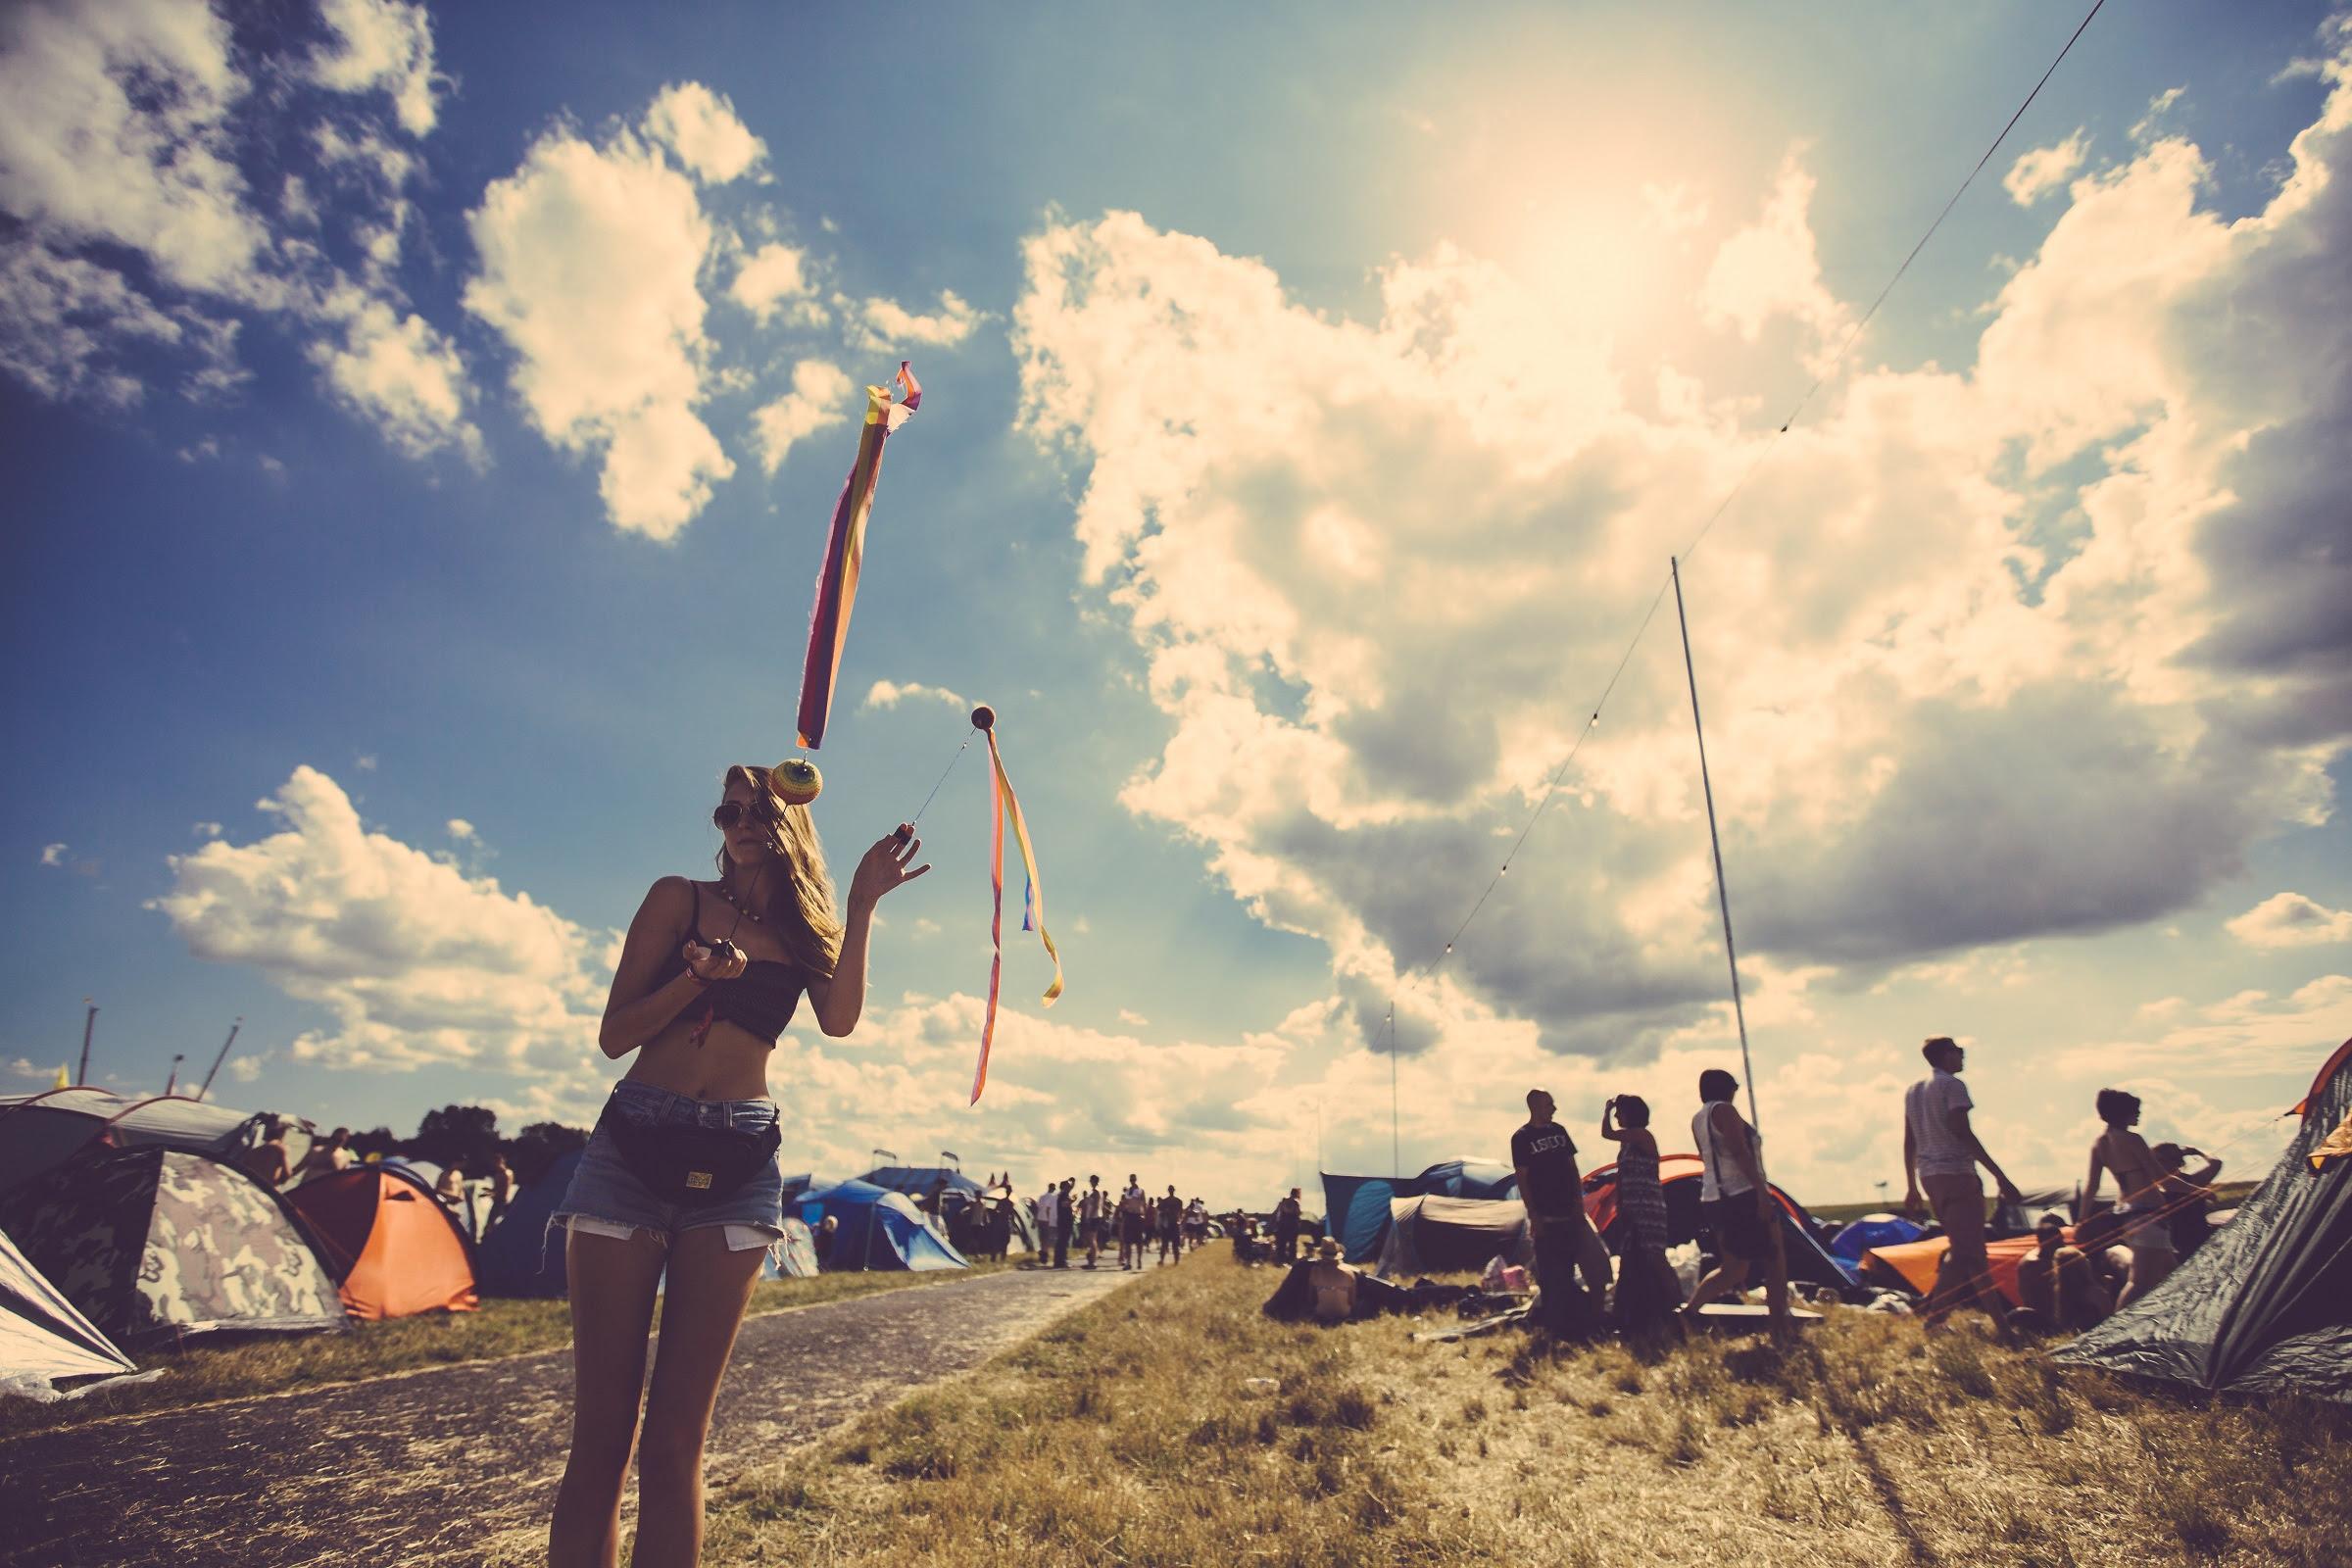 foto: © Paul Underhill van meisje met korte broek op terrein festival